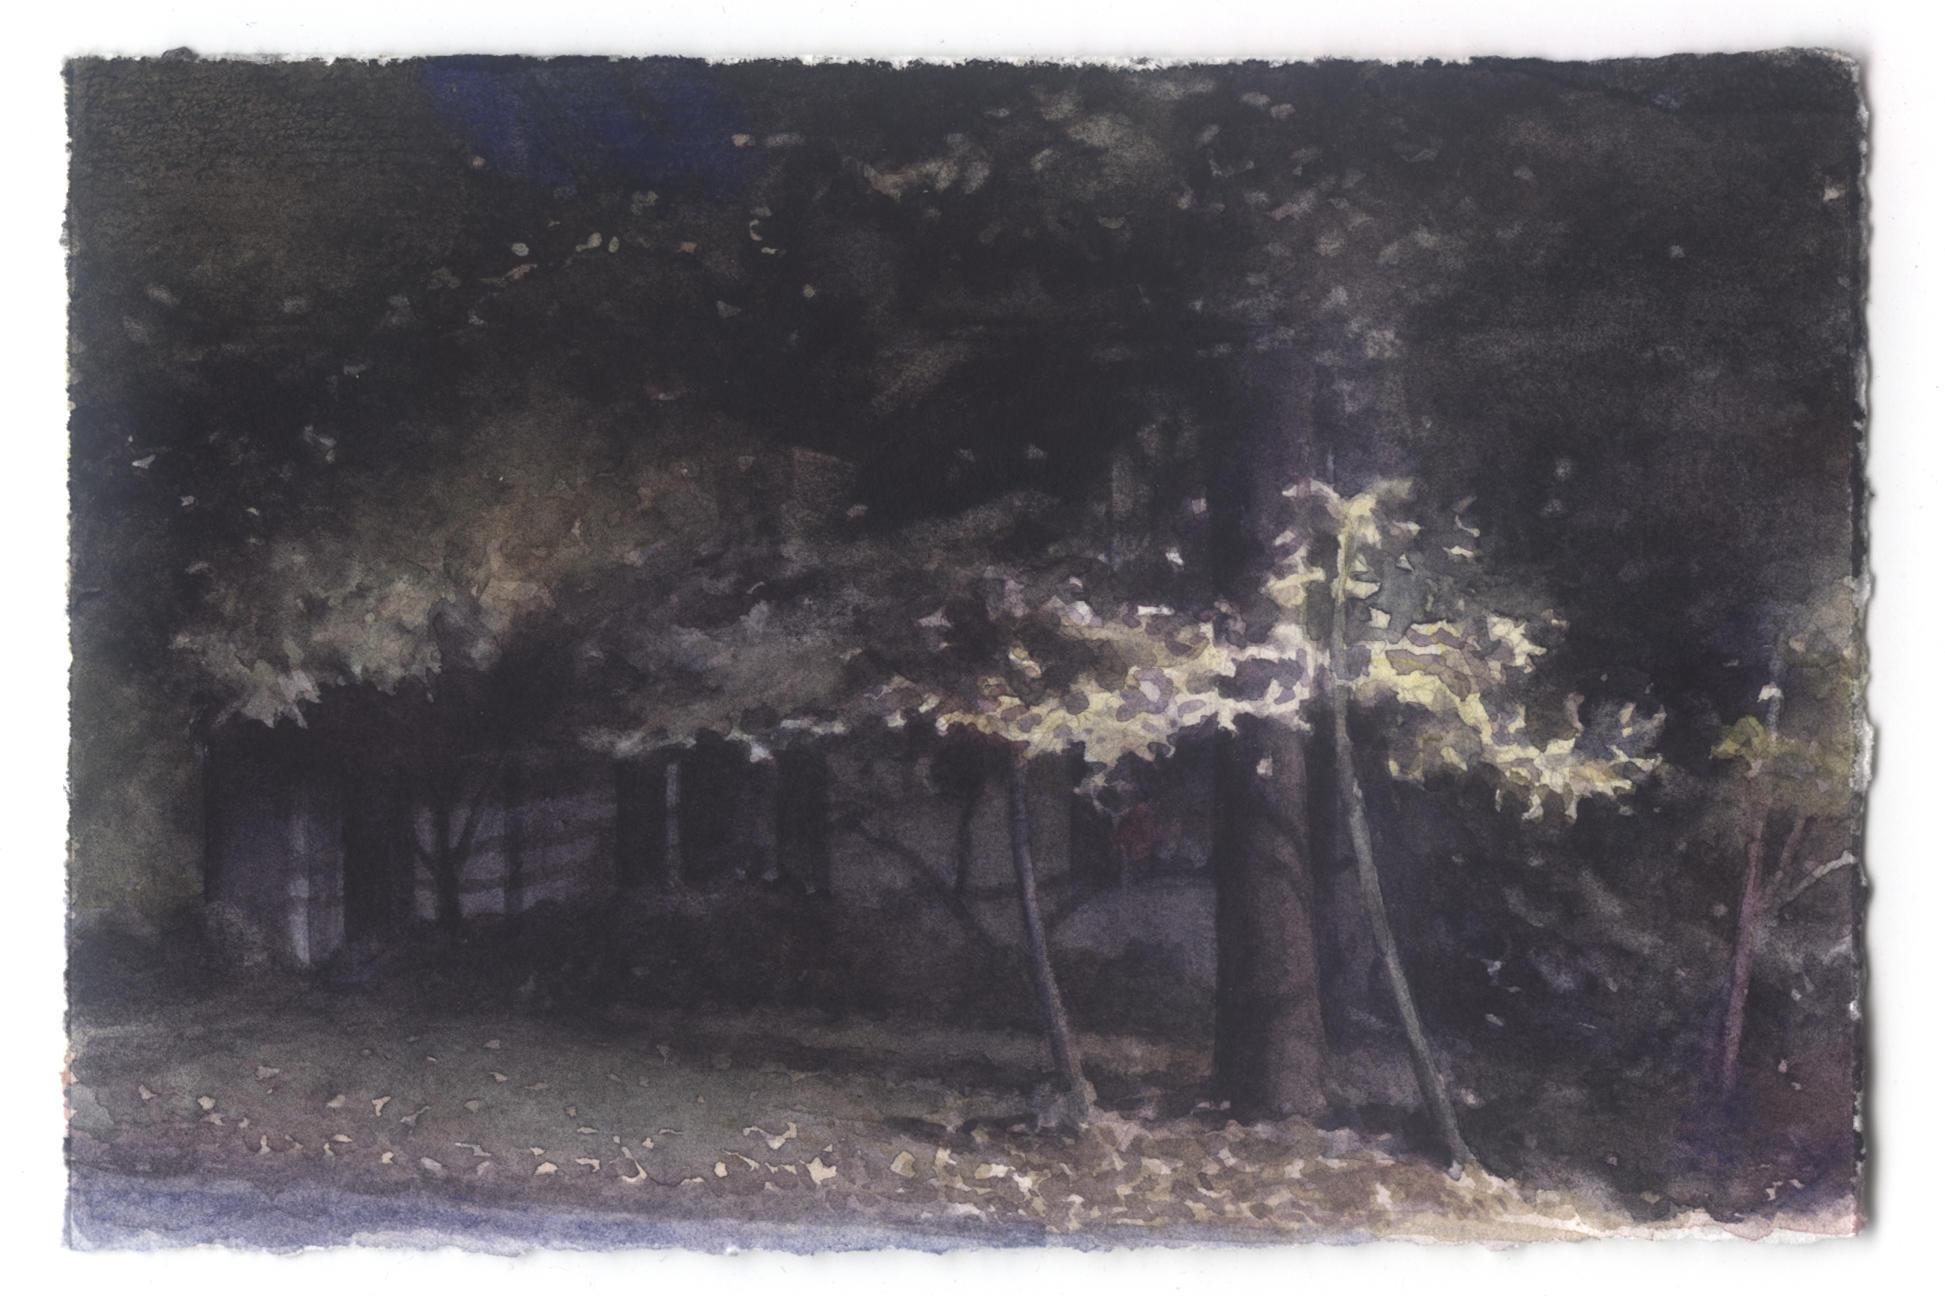 Dark House: Early Fall image